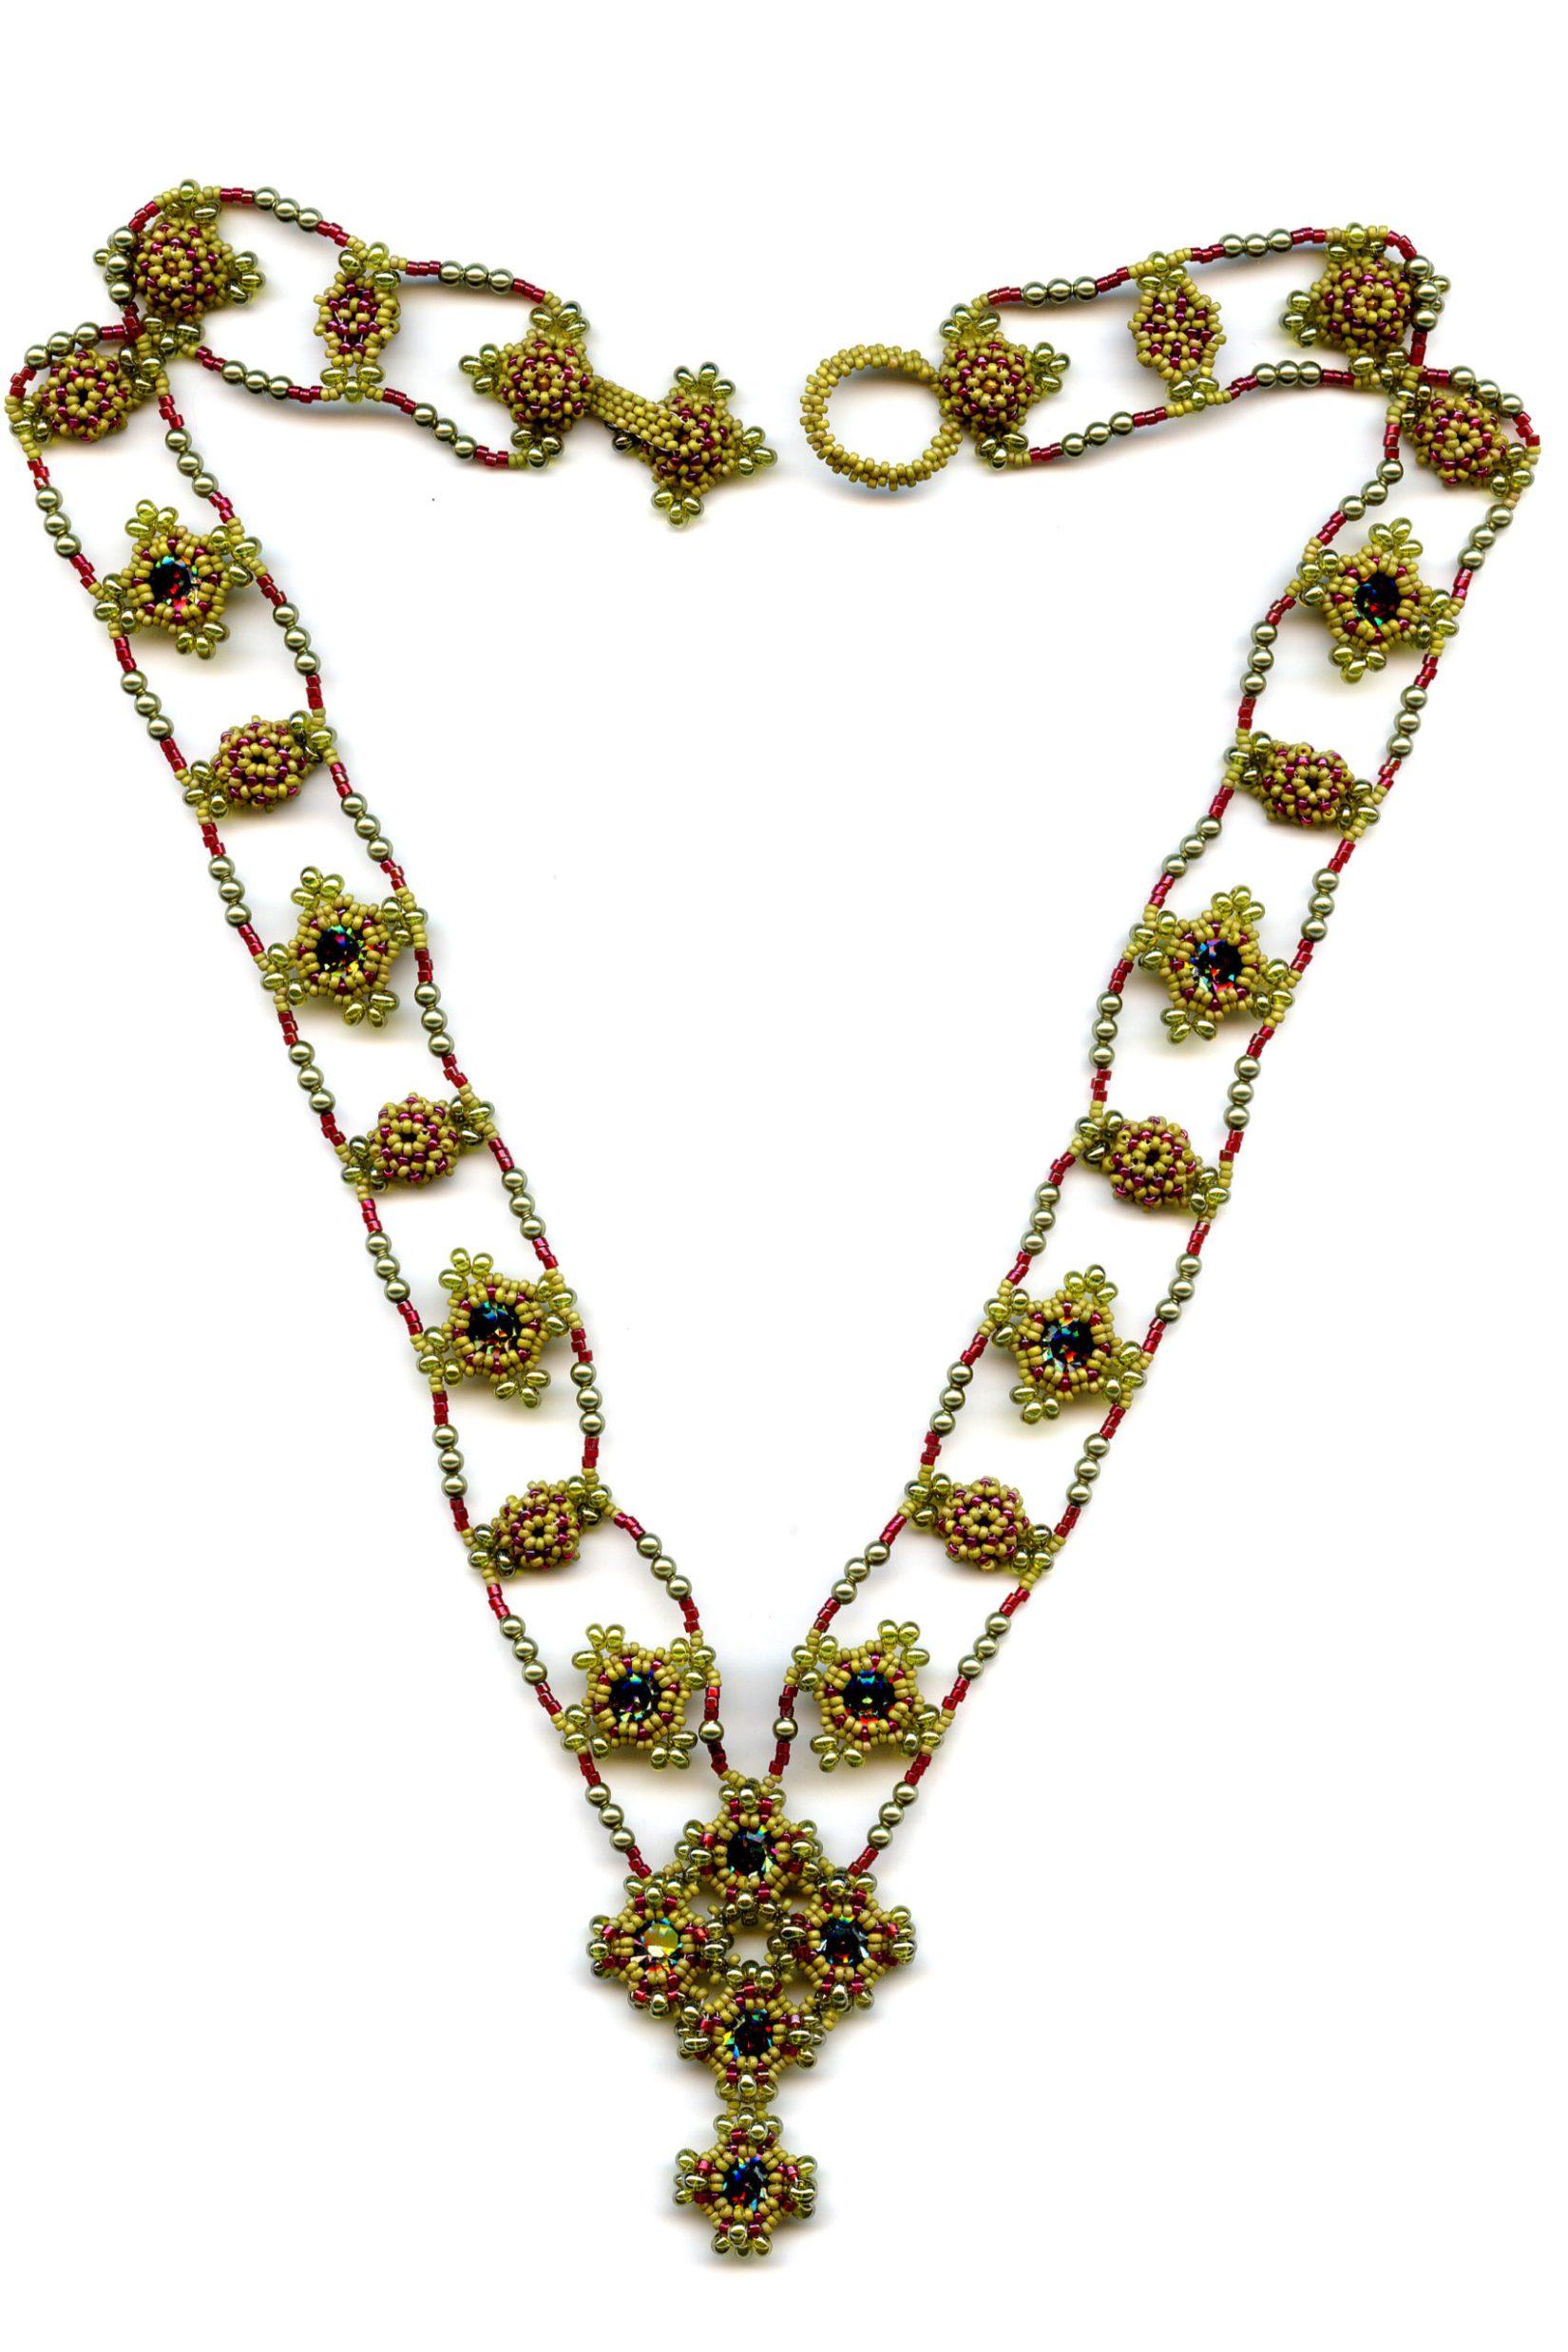 Byzantine Jewels Beaded Necklace Olive, Red, Vitrail Swarovski Crystal